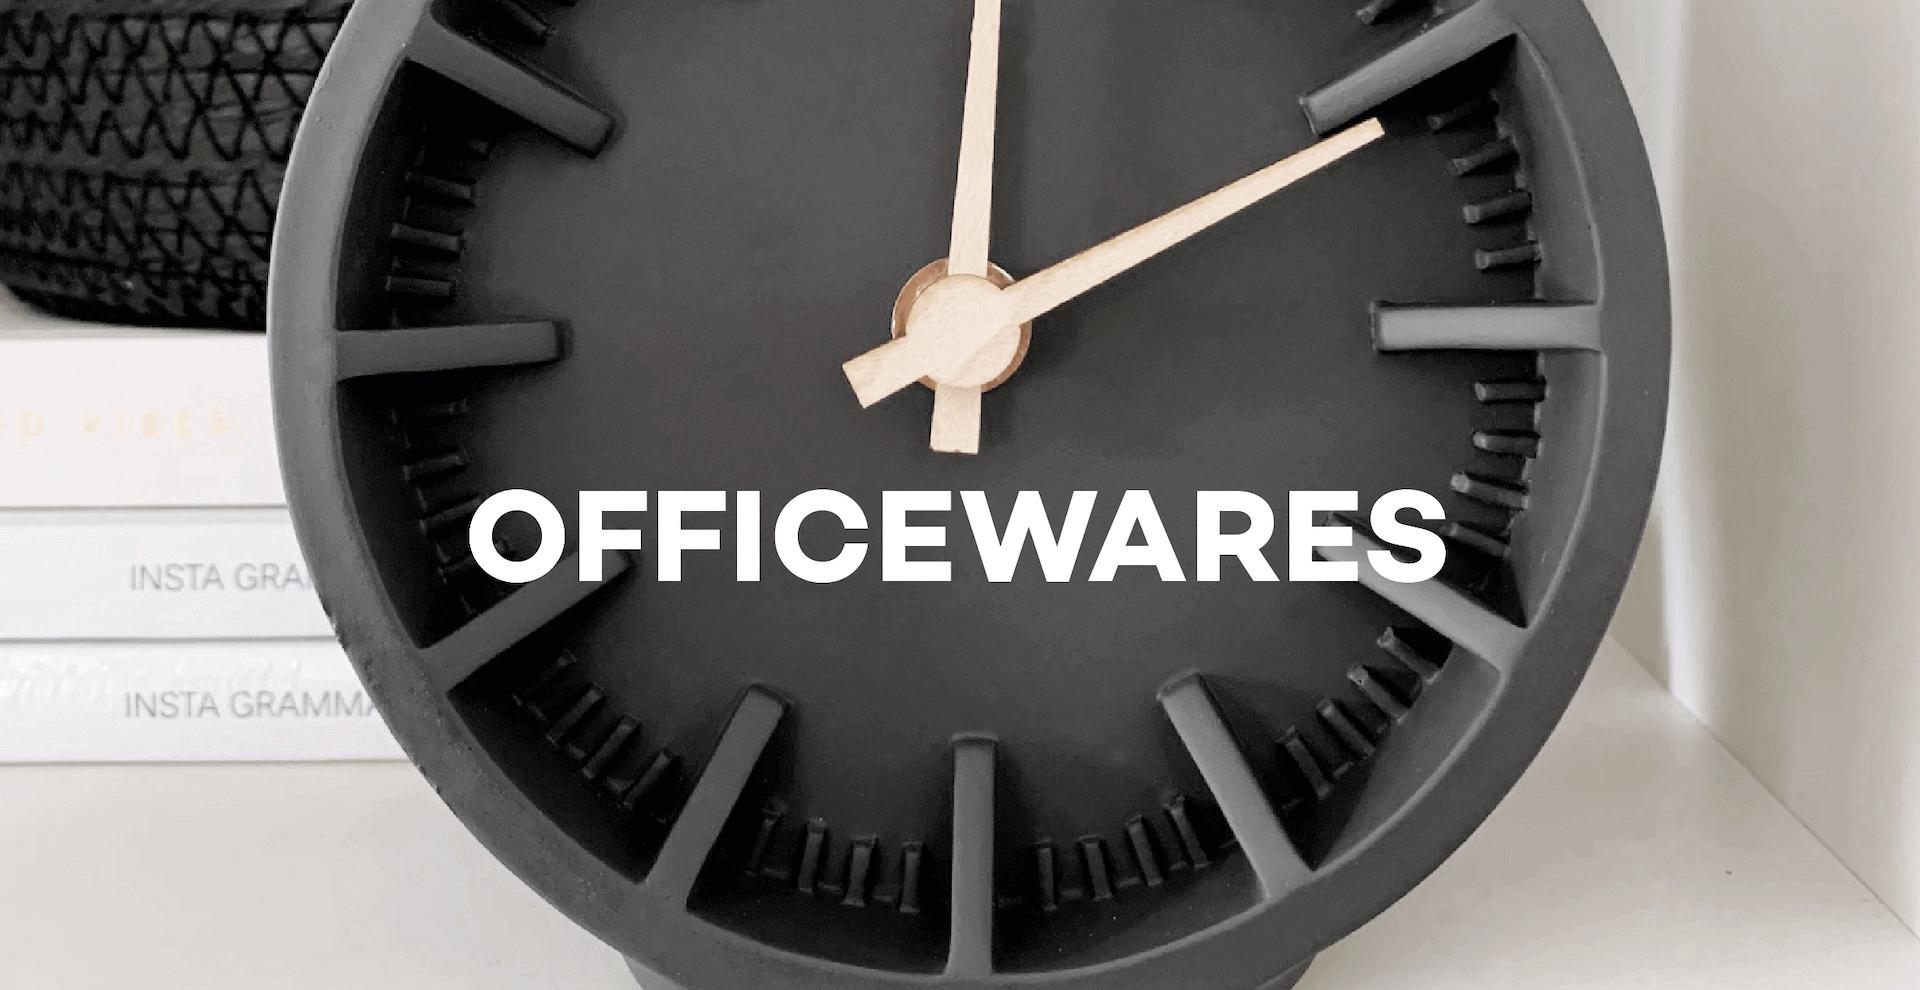 Officewares-Banner-1_resized2